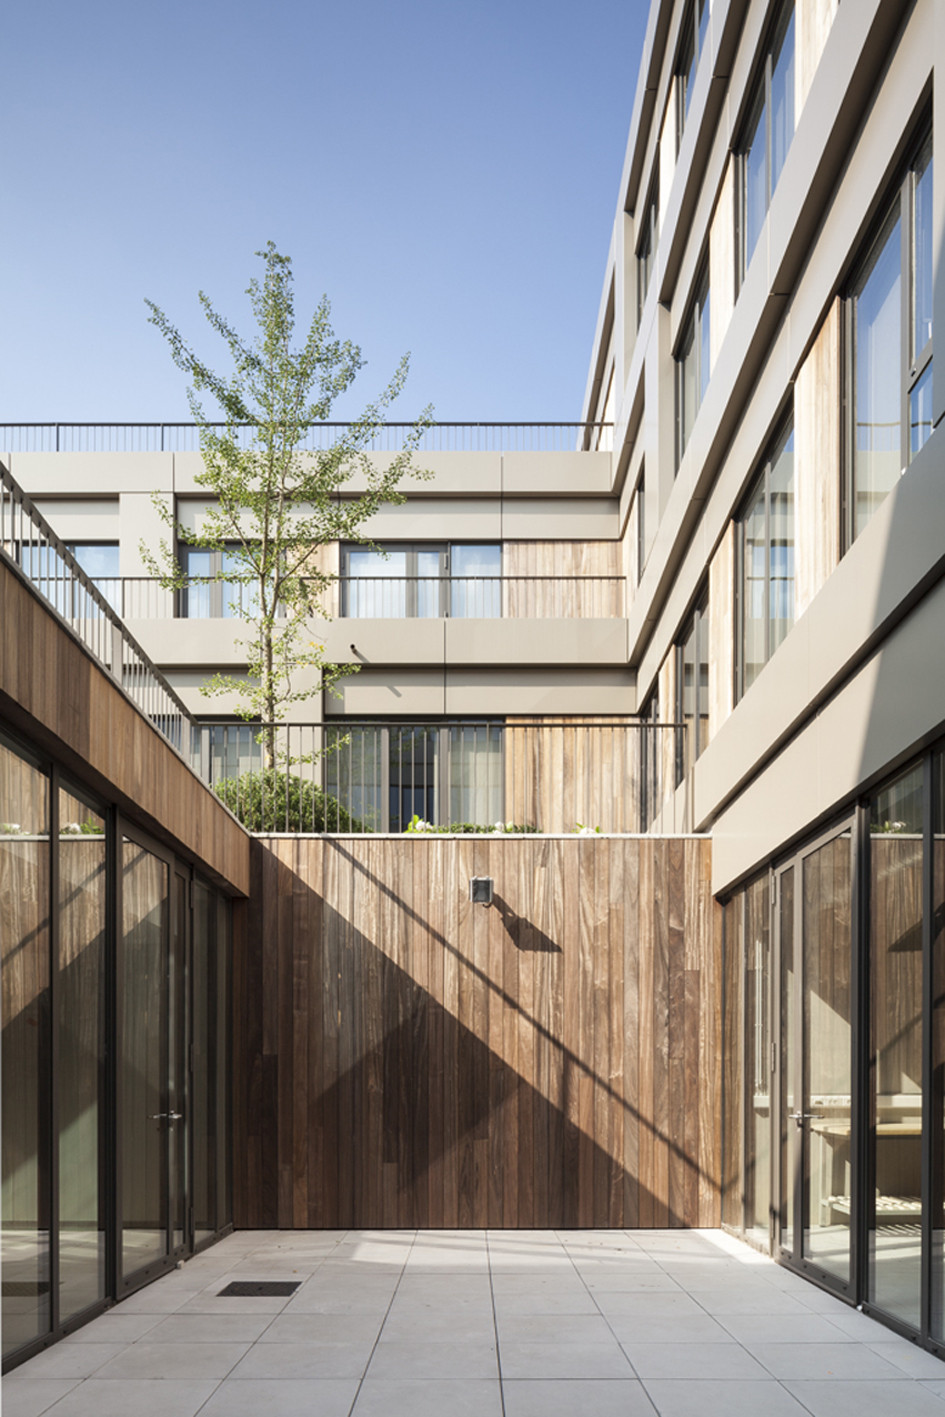 Gallery Of Elderly Care Campus Areal Architecten 2: nursing home architecture